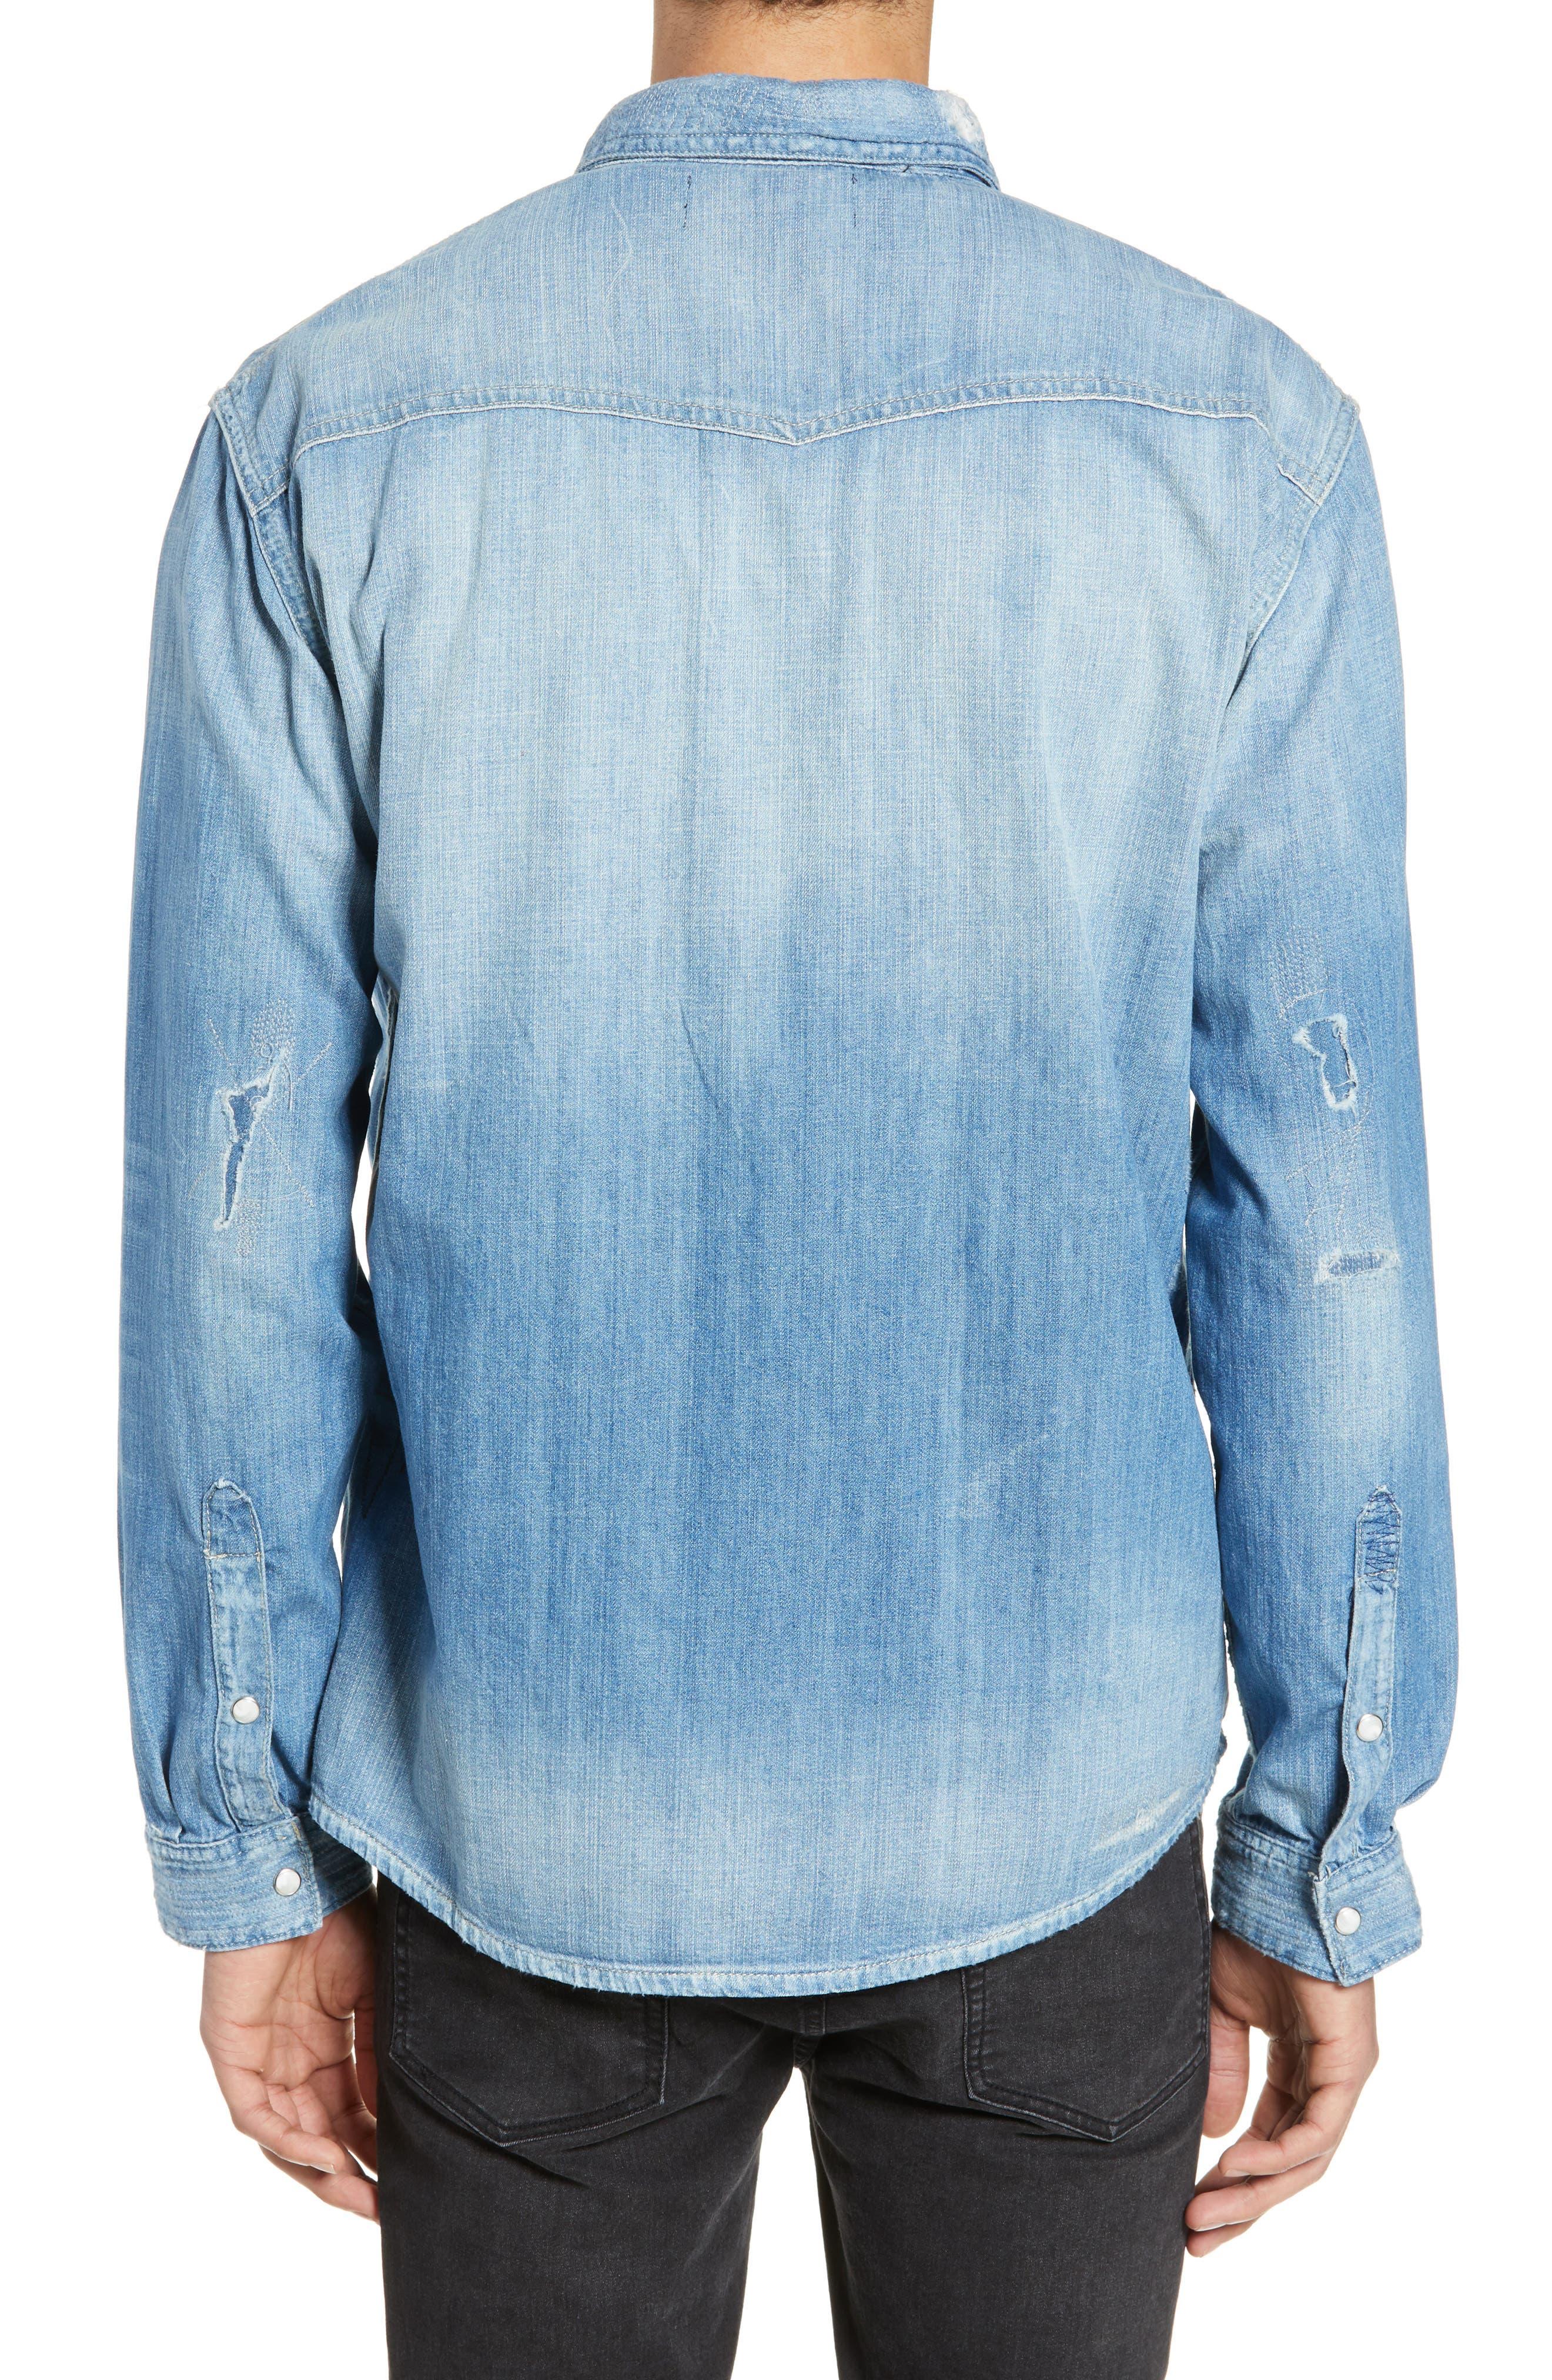 THE KOOPLES, Ripped Denim Shirt, Alternate thumbnail 2, color, BLUE DENIM